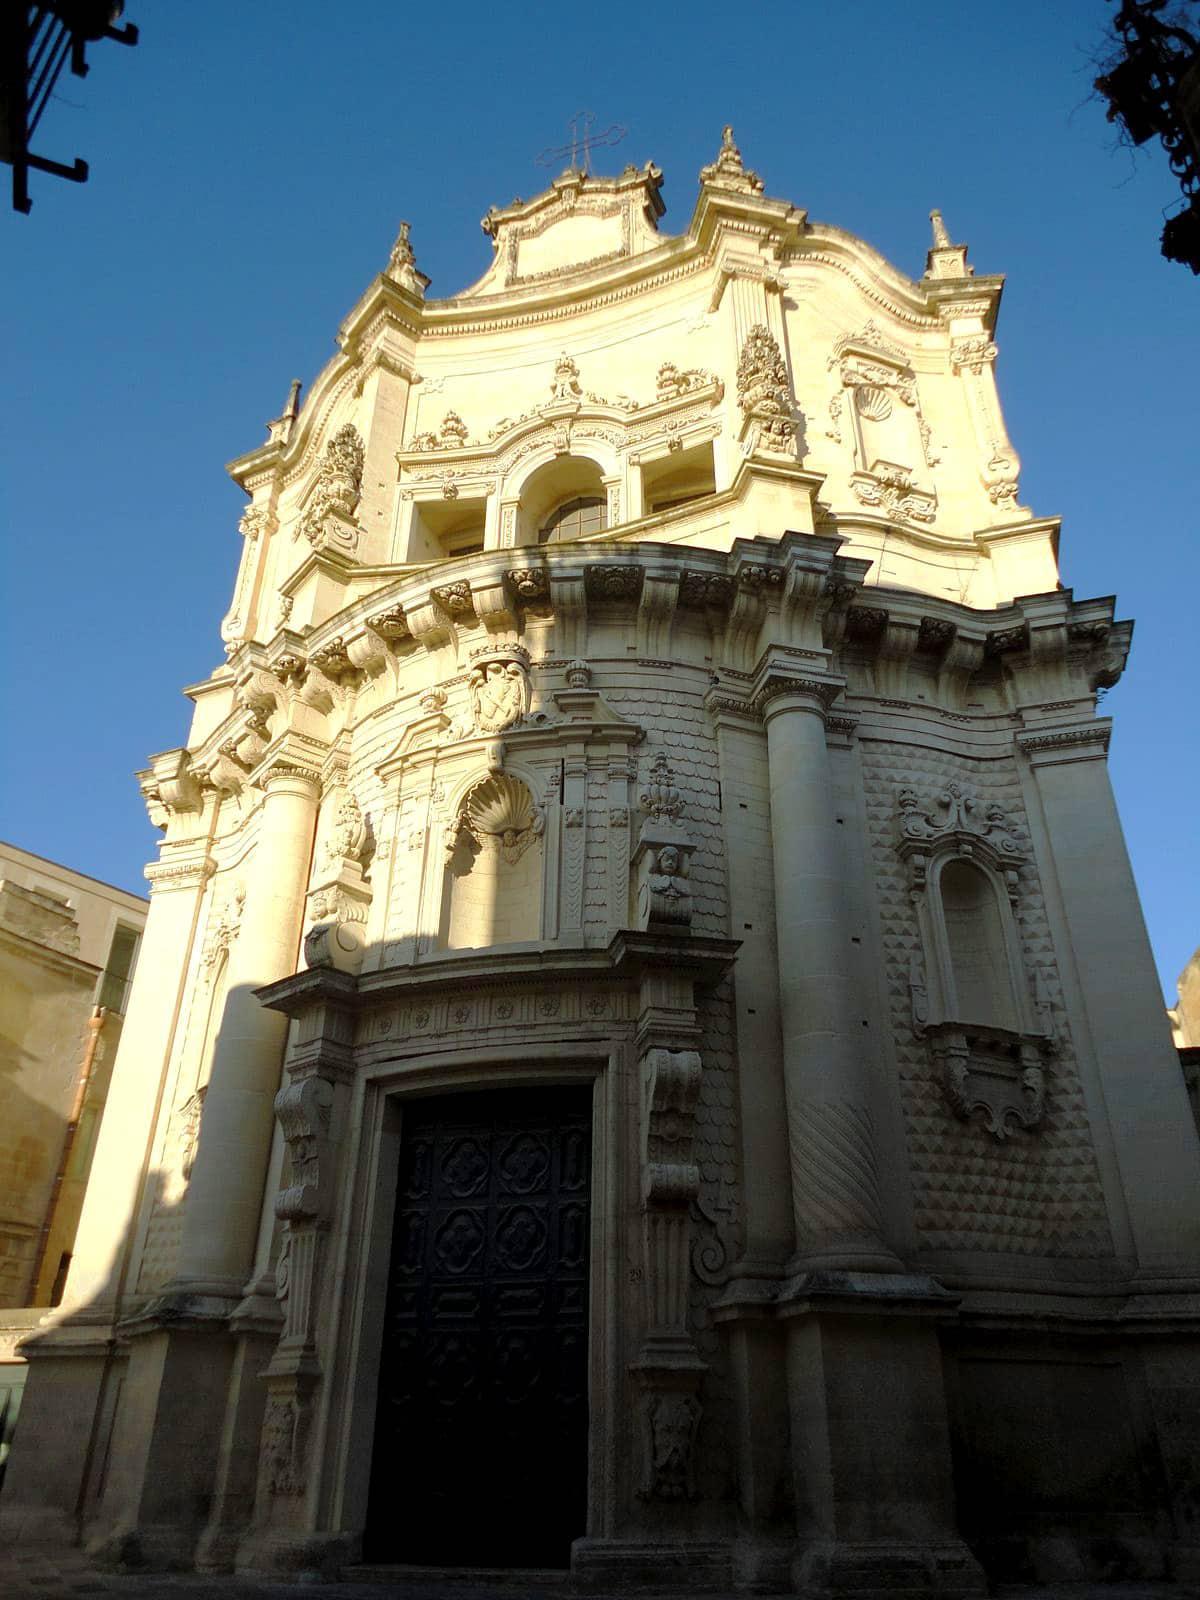 202104261513591200px-Lecce_Chiesa_di_San_matteo.jpg